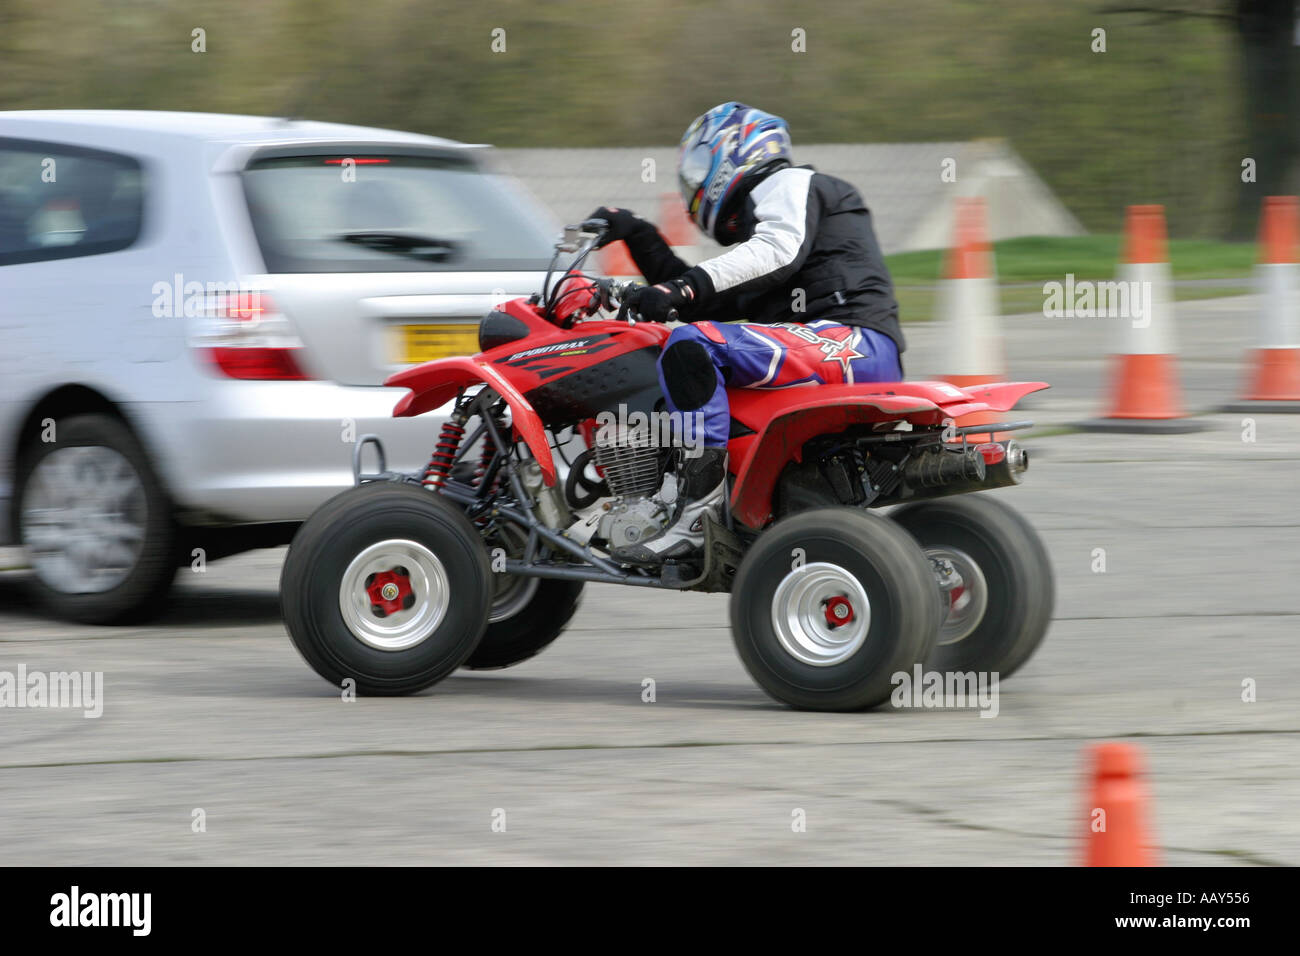 A stuntman puts a quad bike through its paces - Stock Image